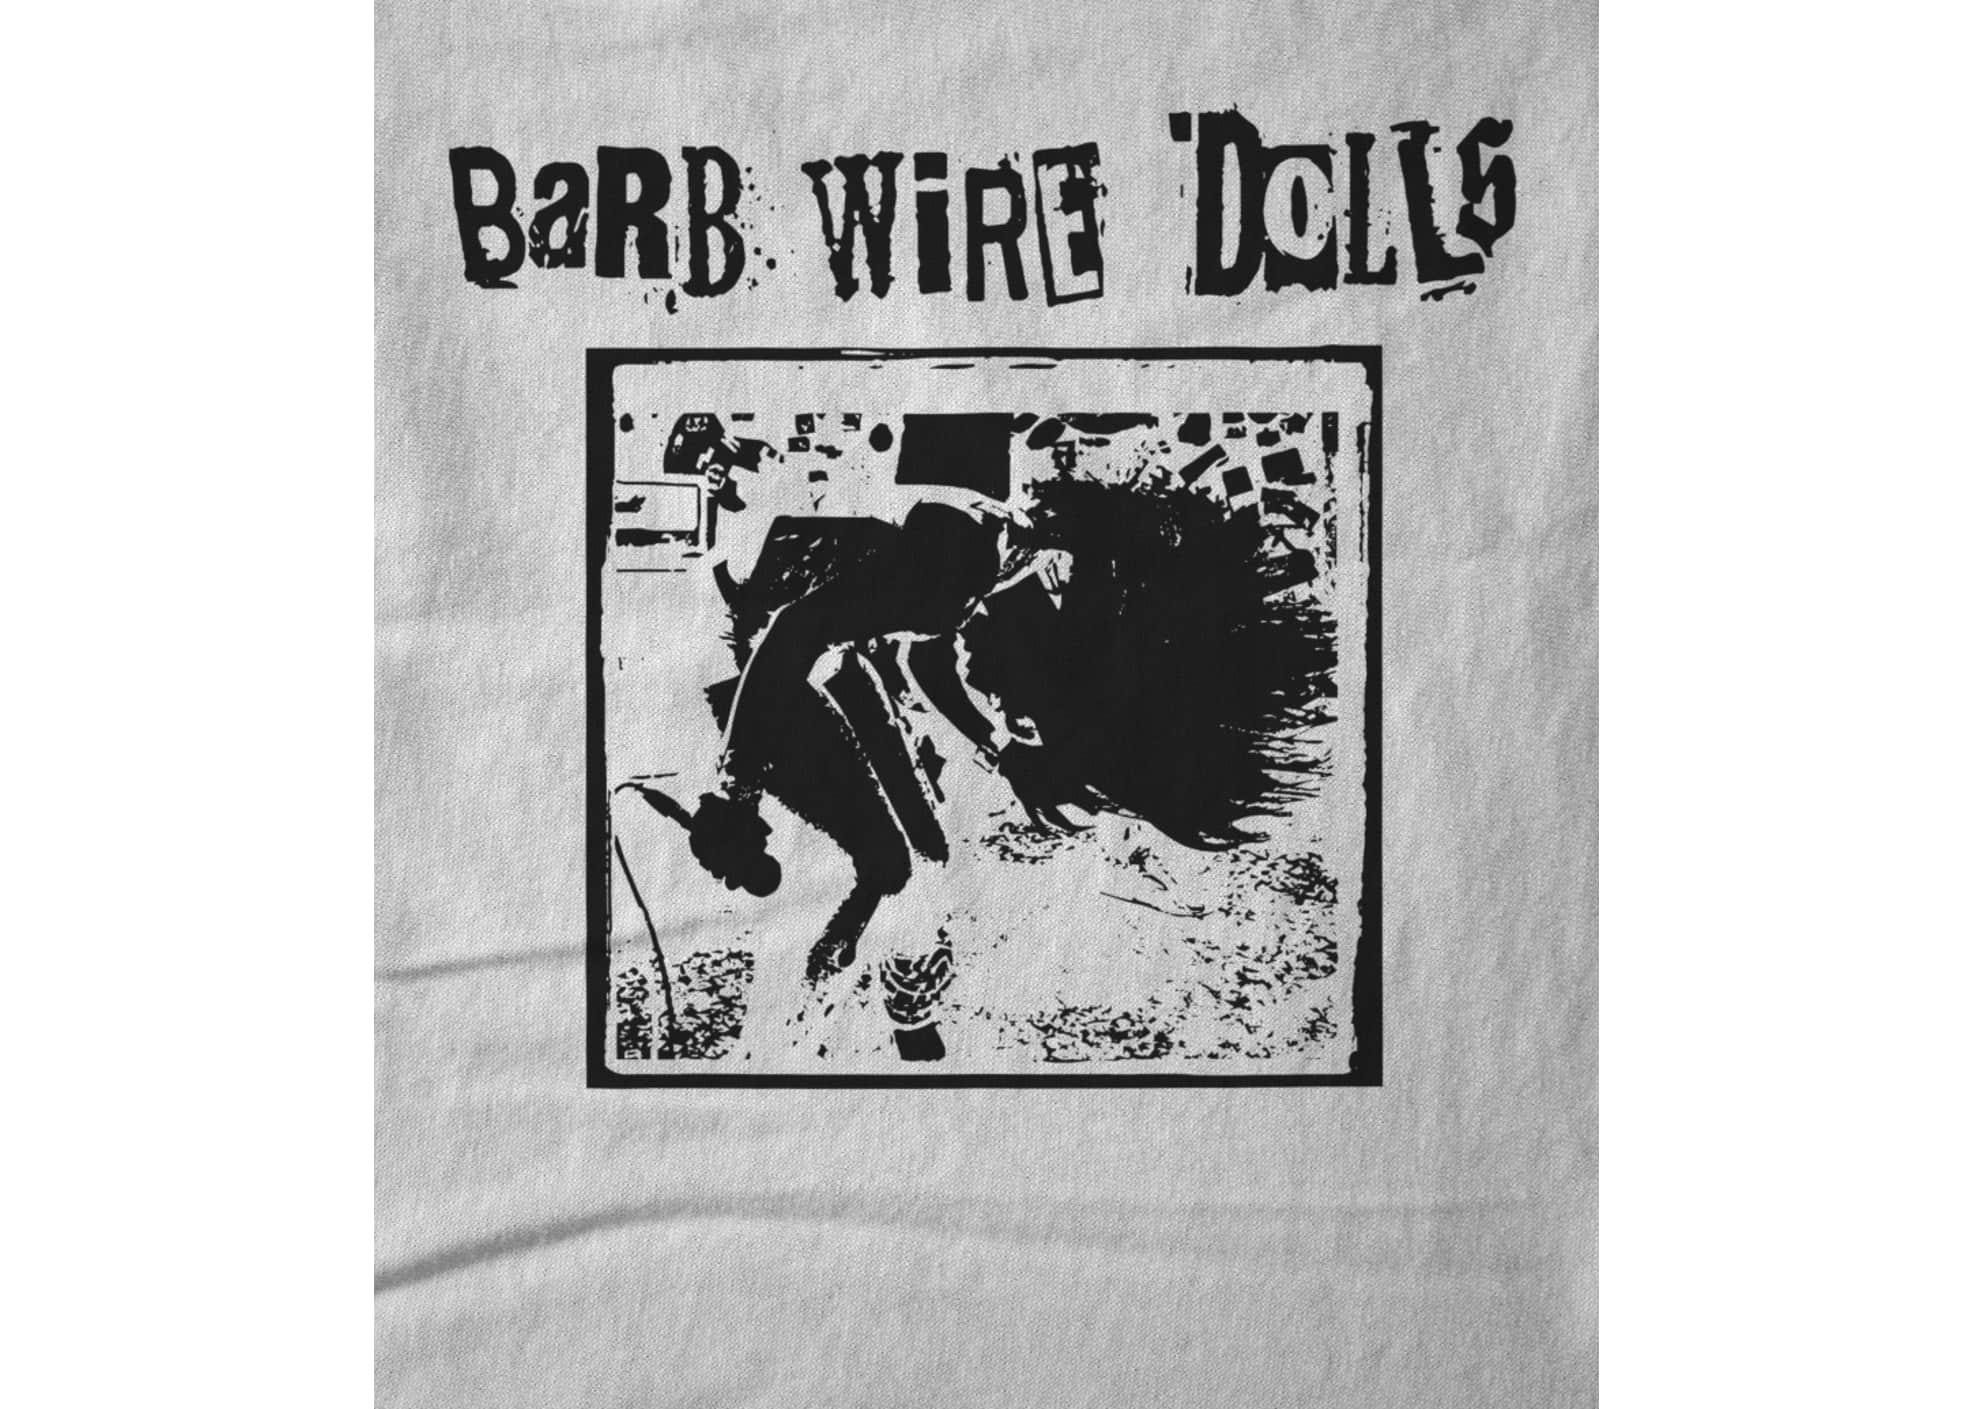 Barb wire dolls   official logo design inverted wrjjan